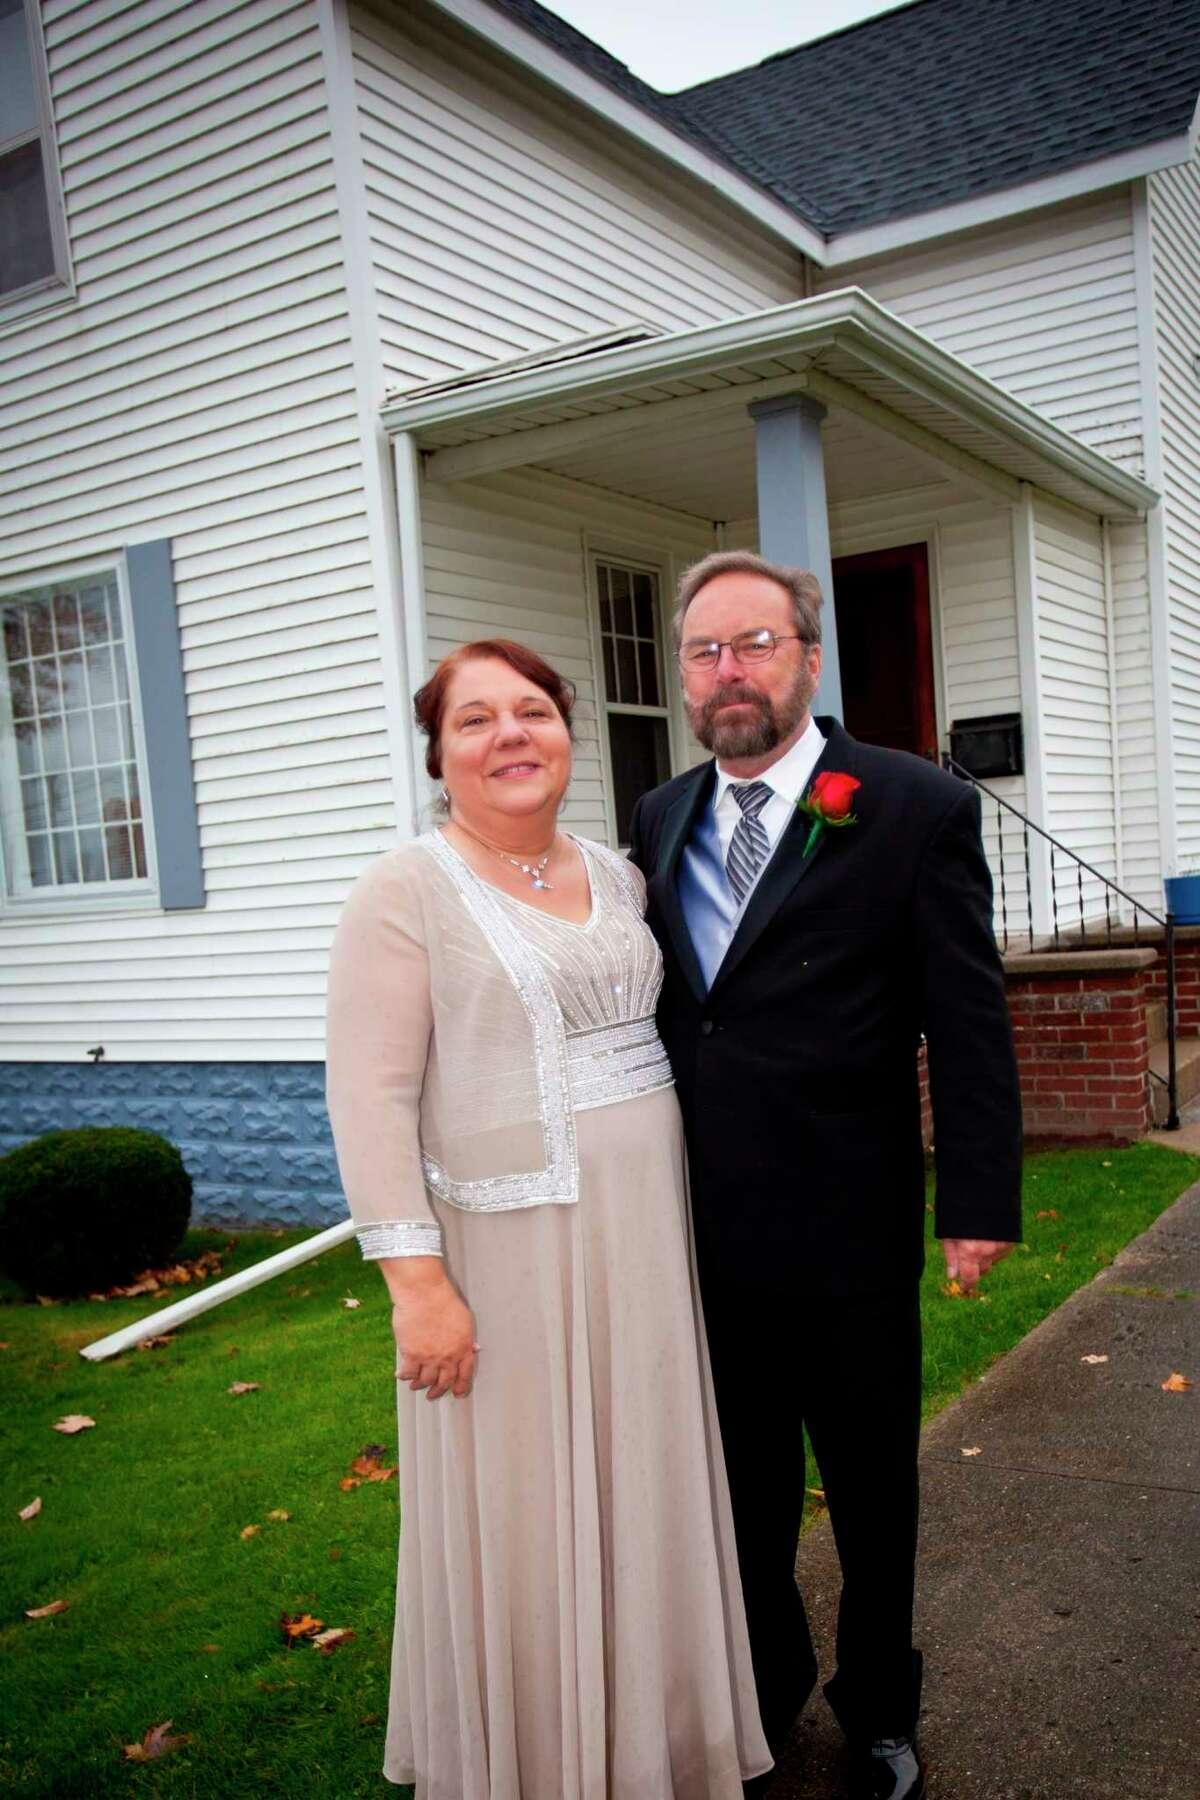 Ken and Karen Libby, then and now. (Courtesy photos)